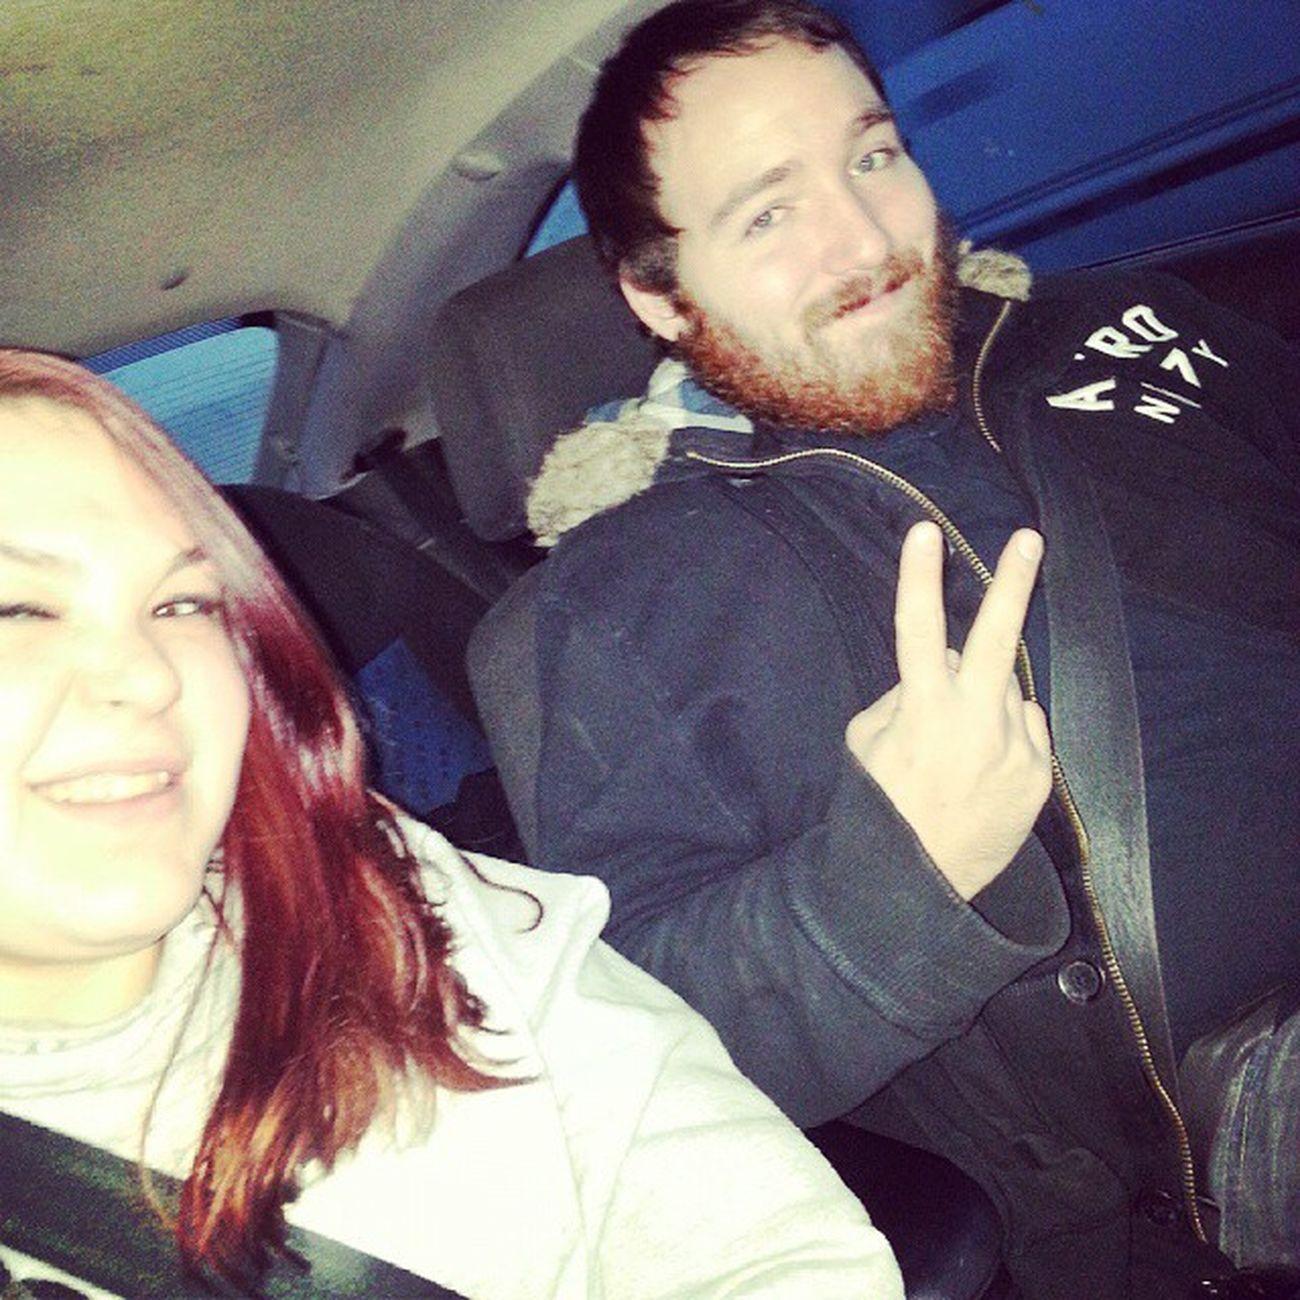 Adventures and good memories with the best friend <3 Spokane & Yelawolf bound. Mybestfriendisbetterthanyours Alwaysthereforme Lovehimtothemoonandback